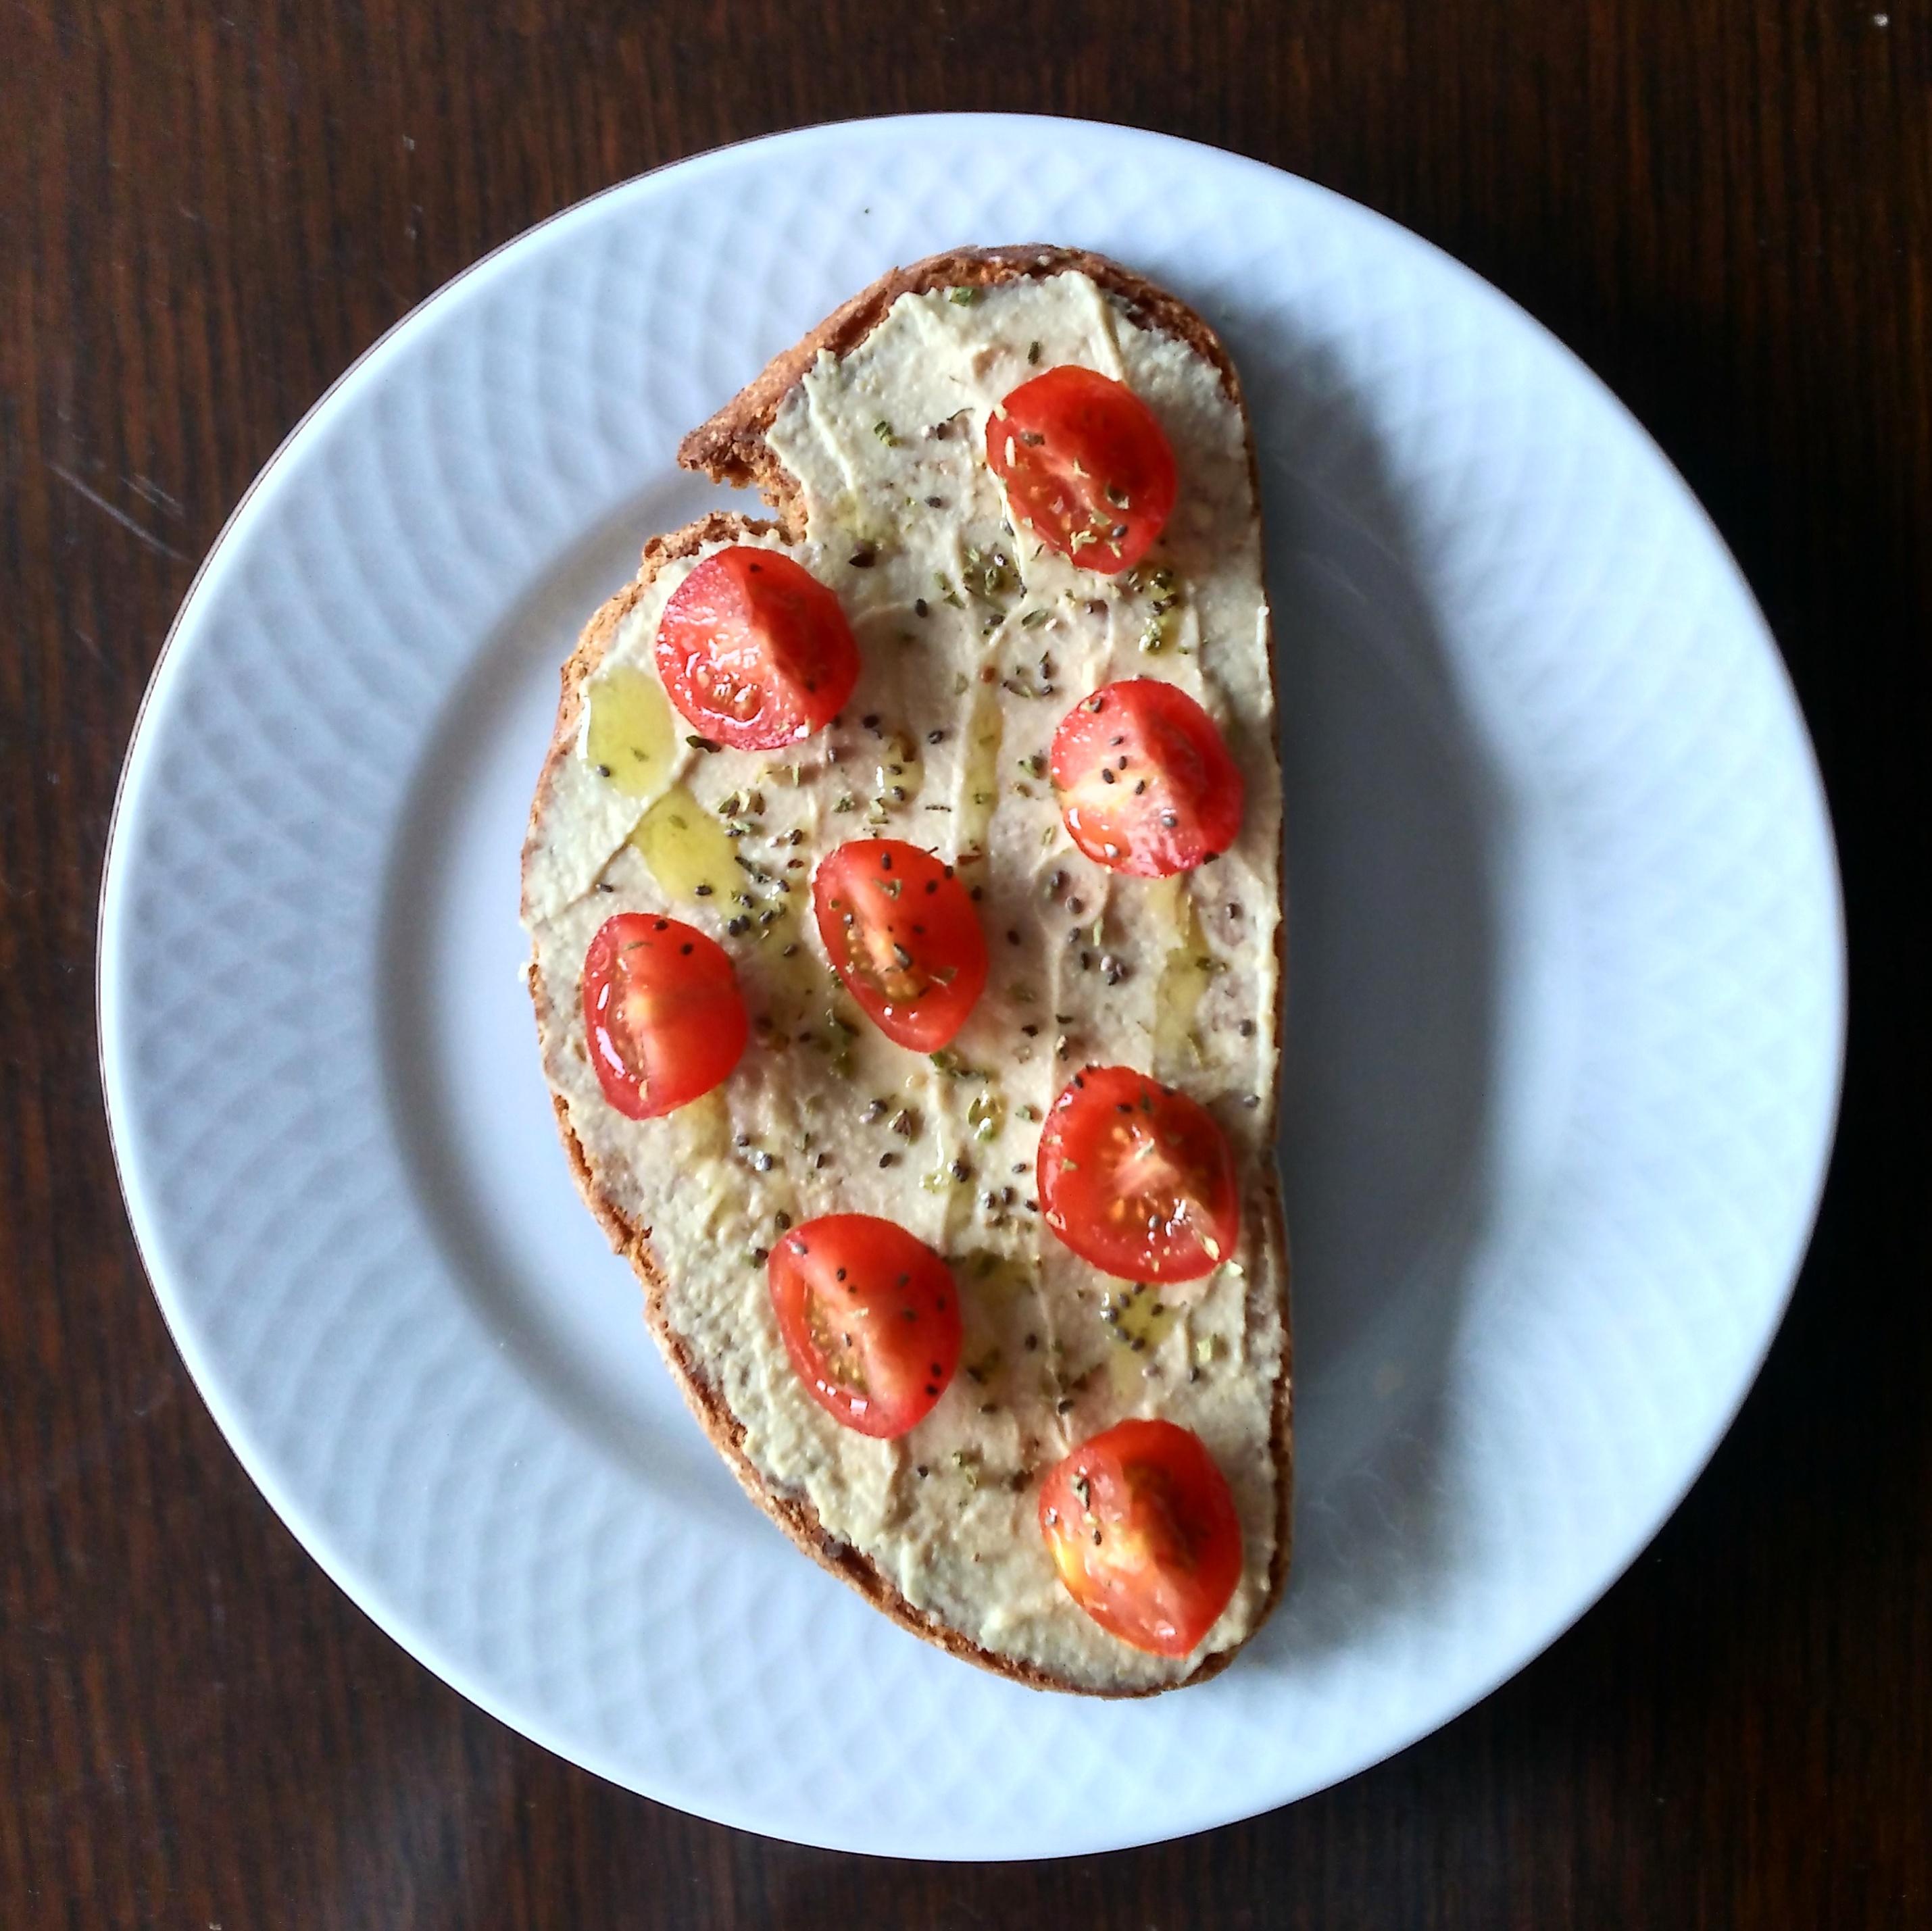 Tostada integral con hummus, tomatitos cherry y orégano